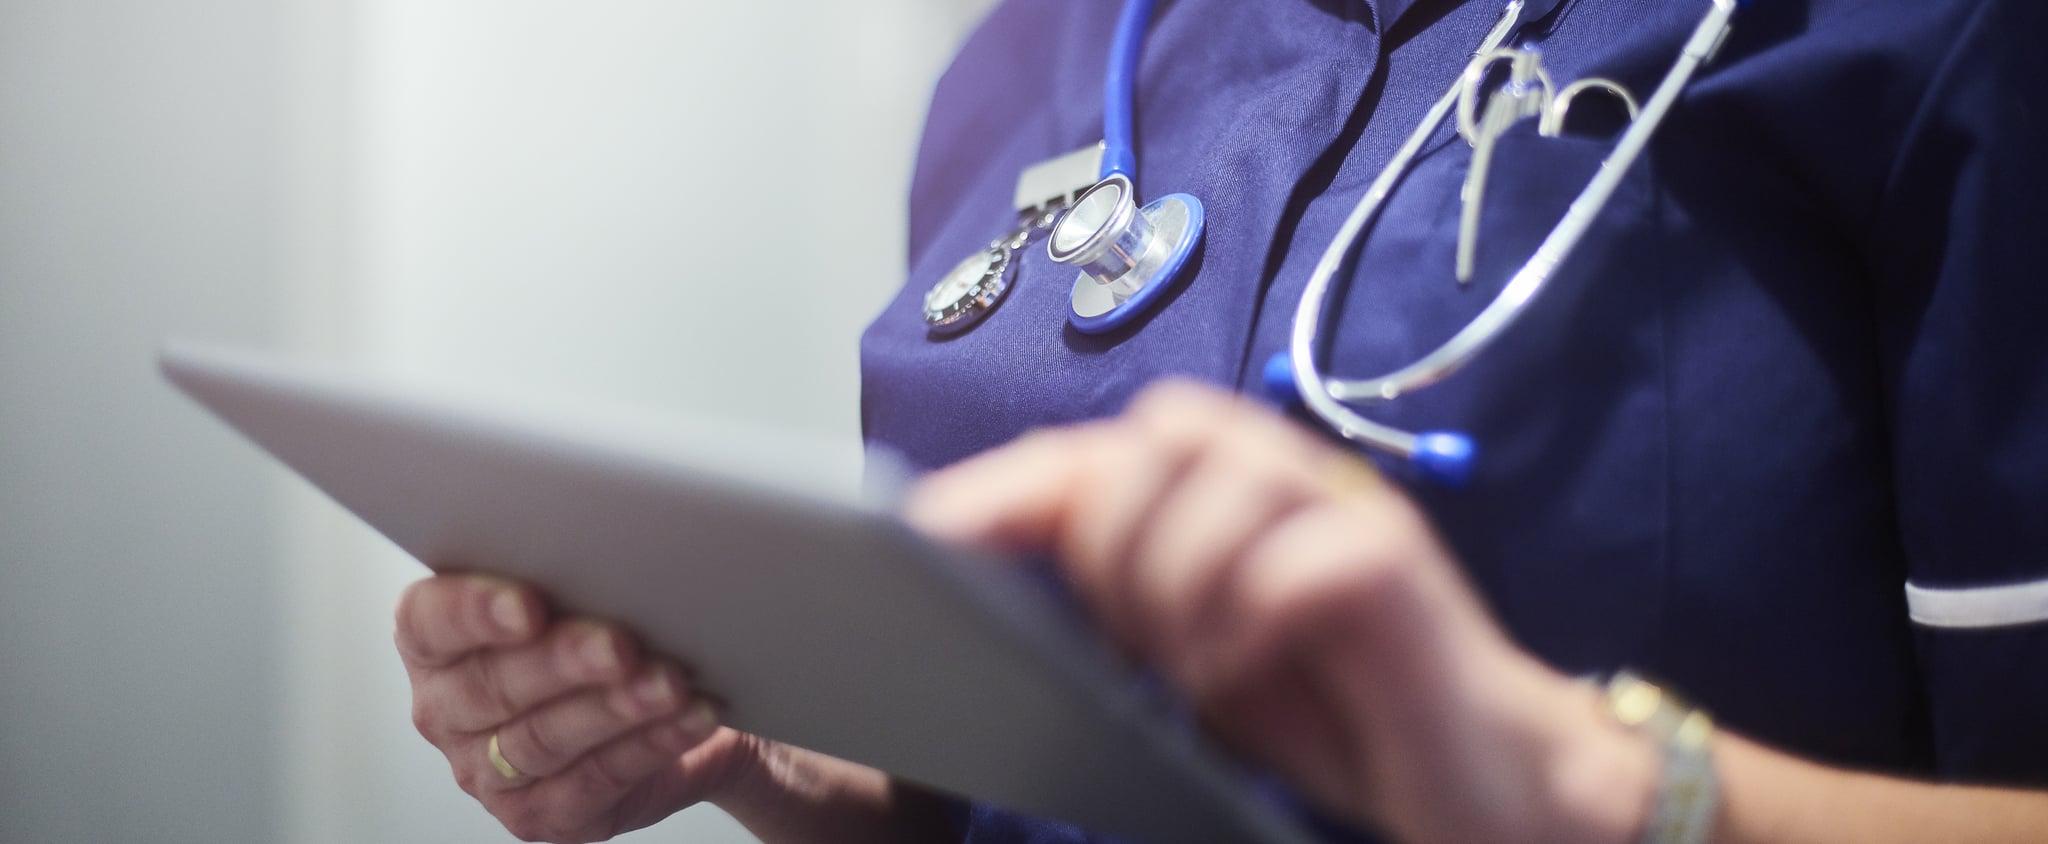 NHS England Launches Coronavirus Rehabilitation Service